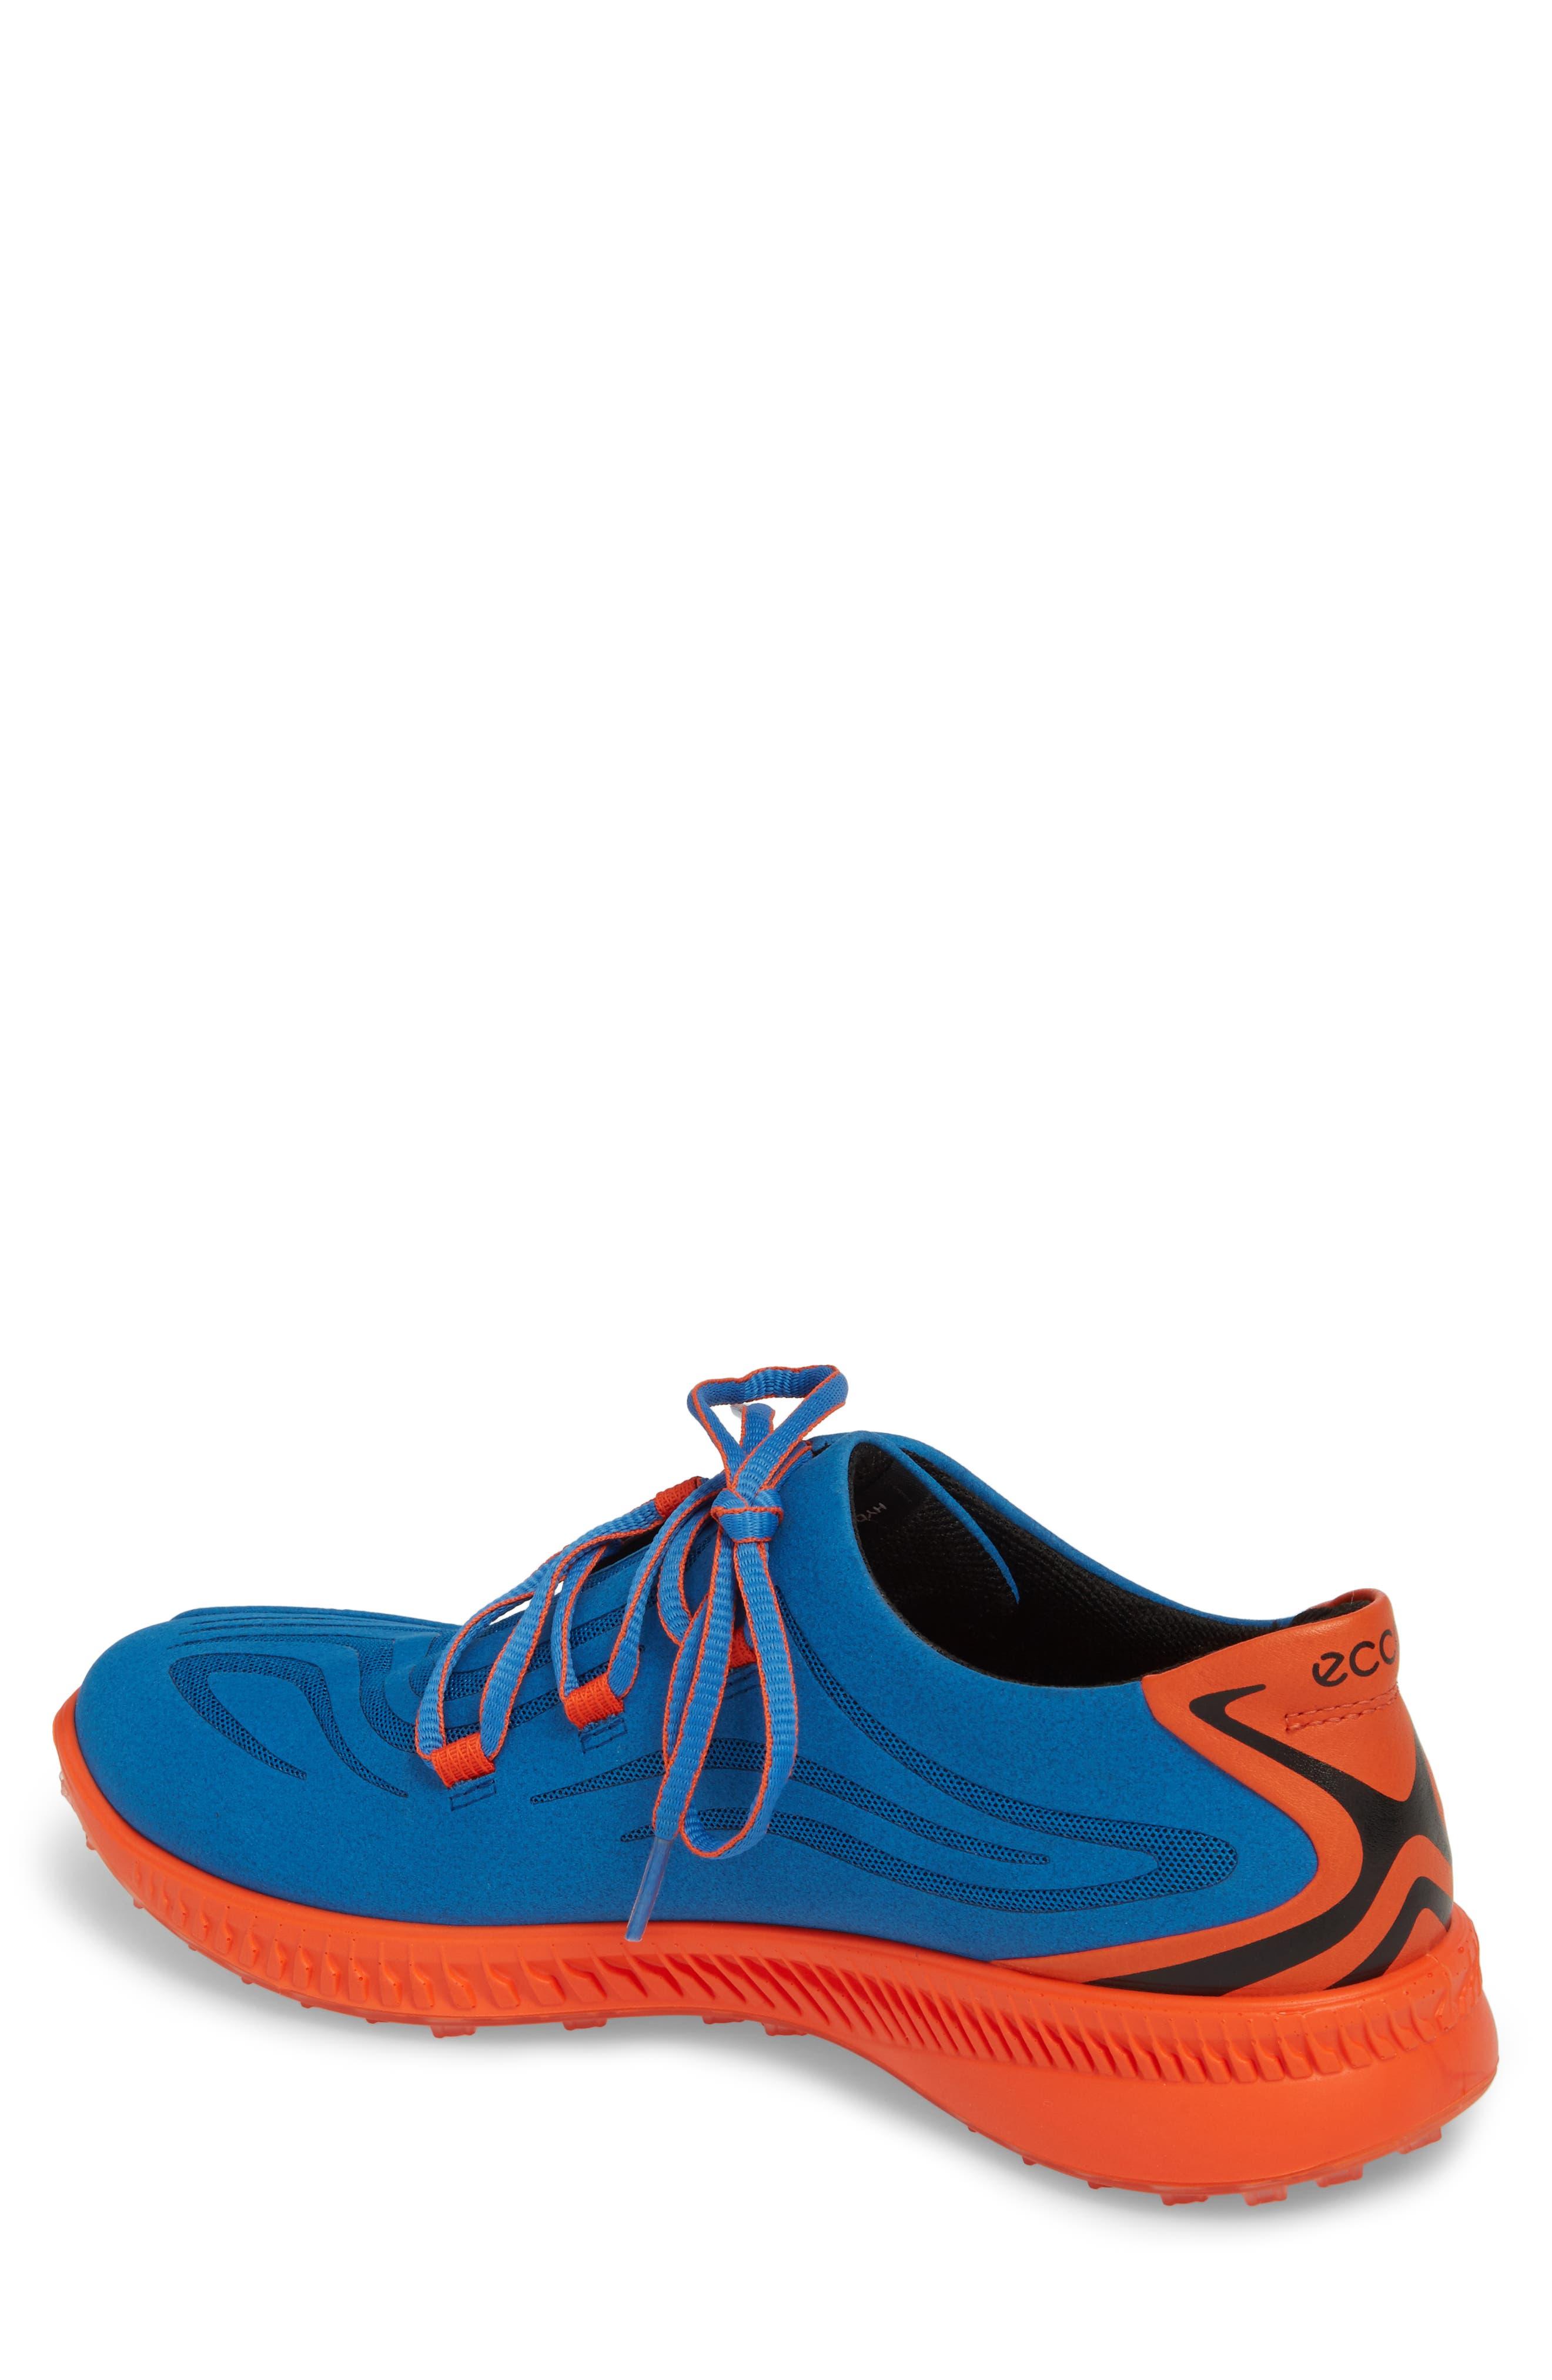 Golf S-Drive Water Resistant Shoe,                             Alternate thumbnail 2, color,                             Bermuda Blue Leather